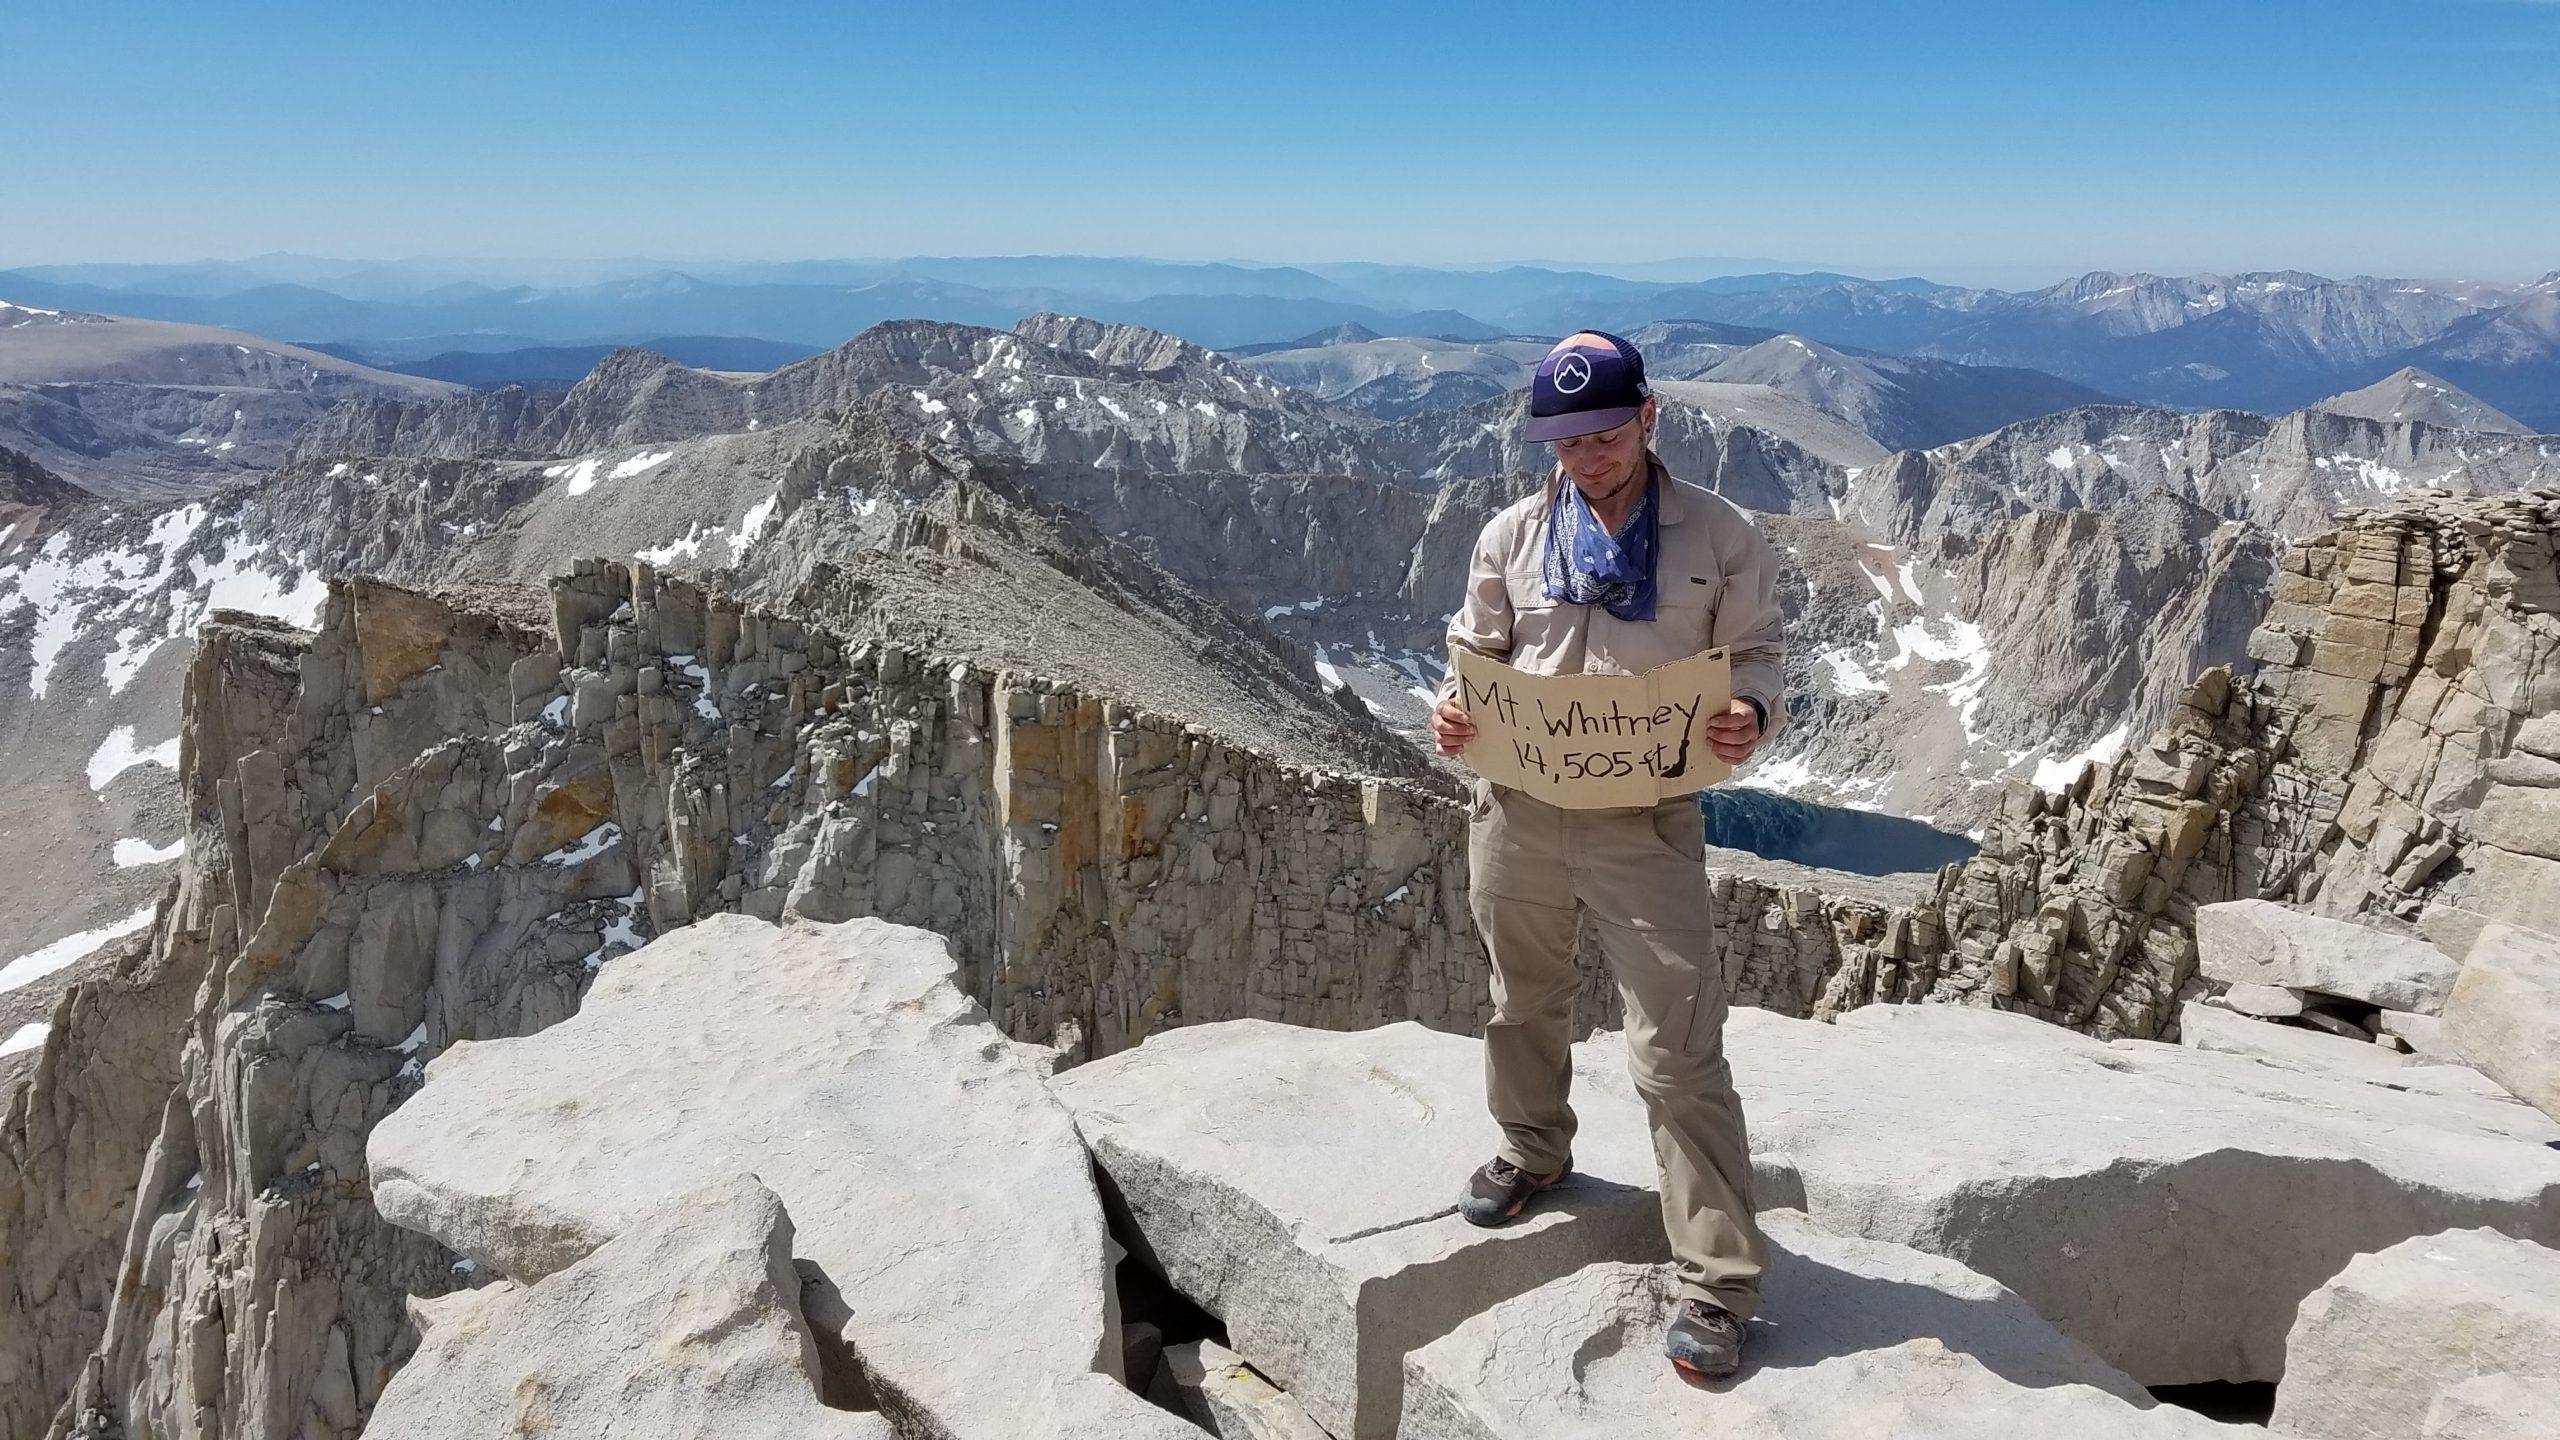 Mt Whitney summit